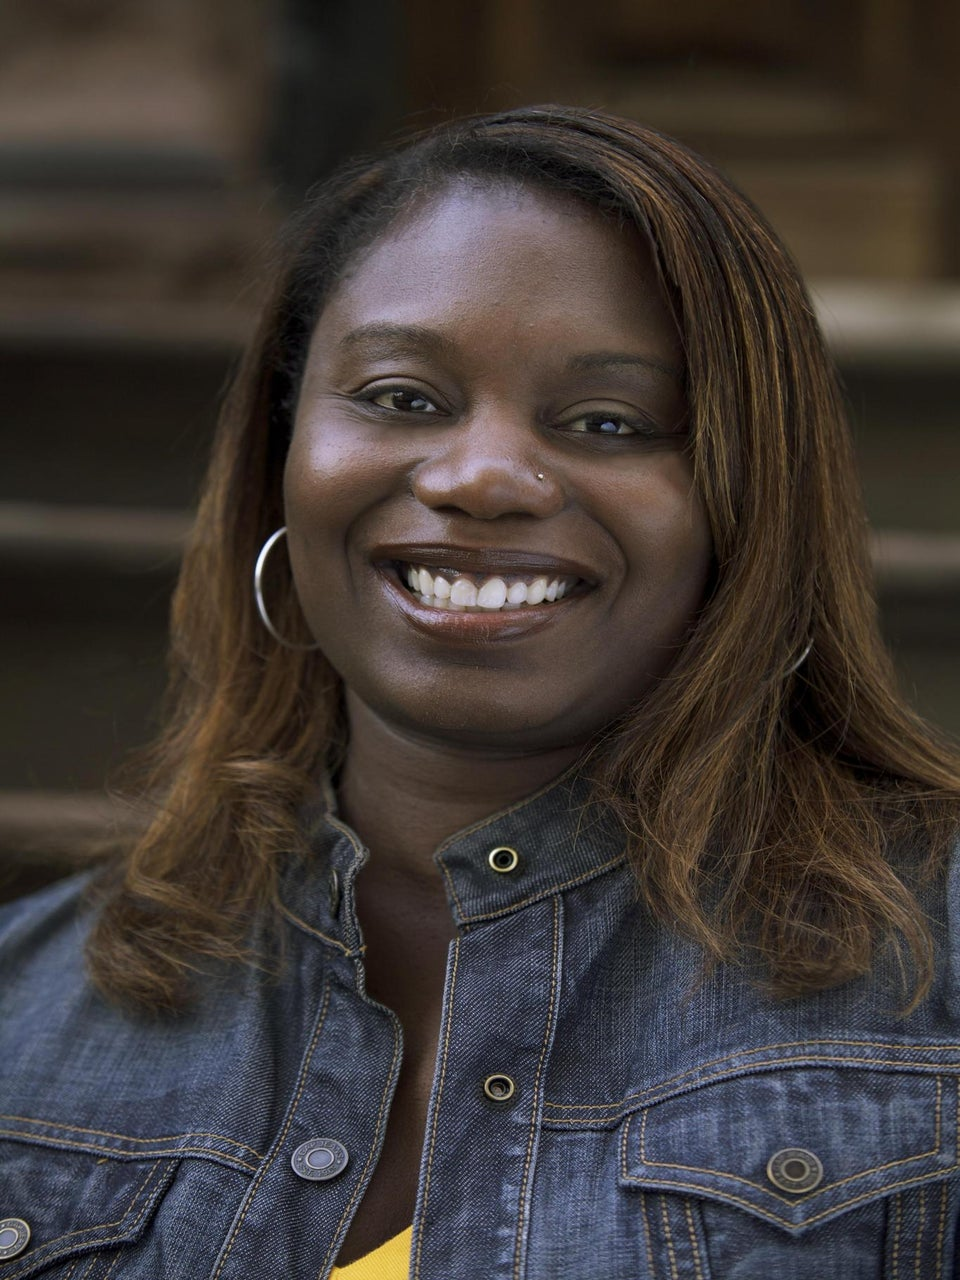 Rising Stars: Meet Co-Founder of Hoseanna.com Tracey Solomon